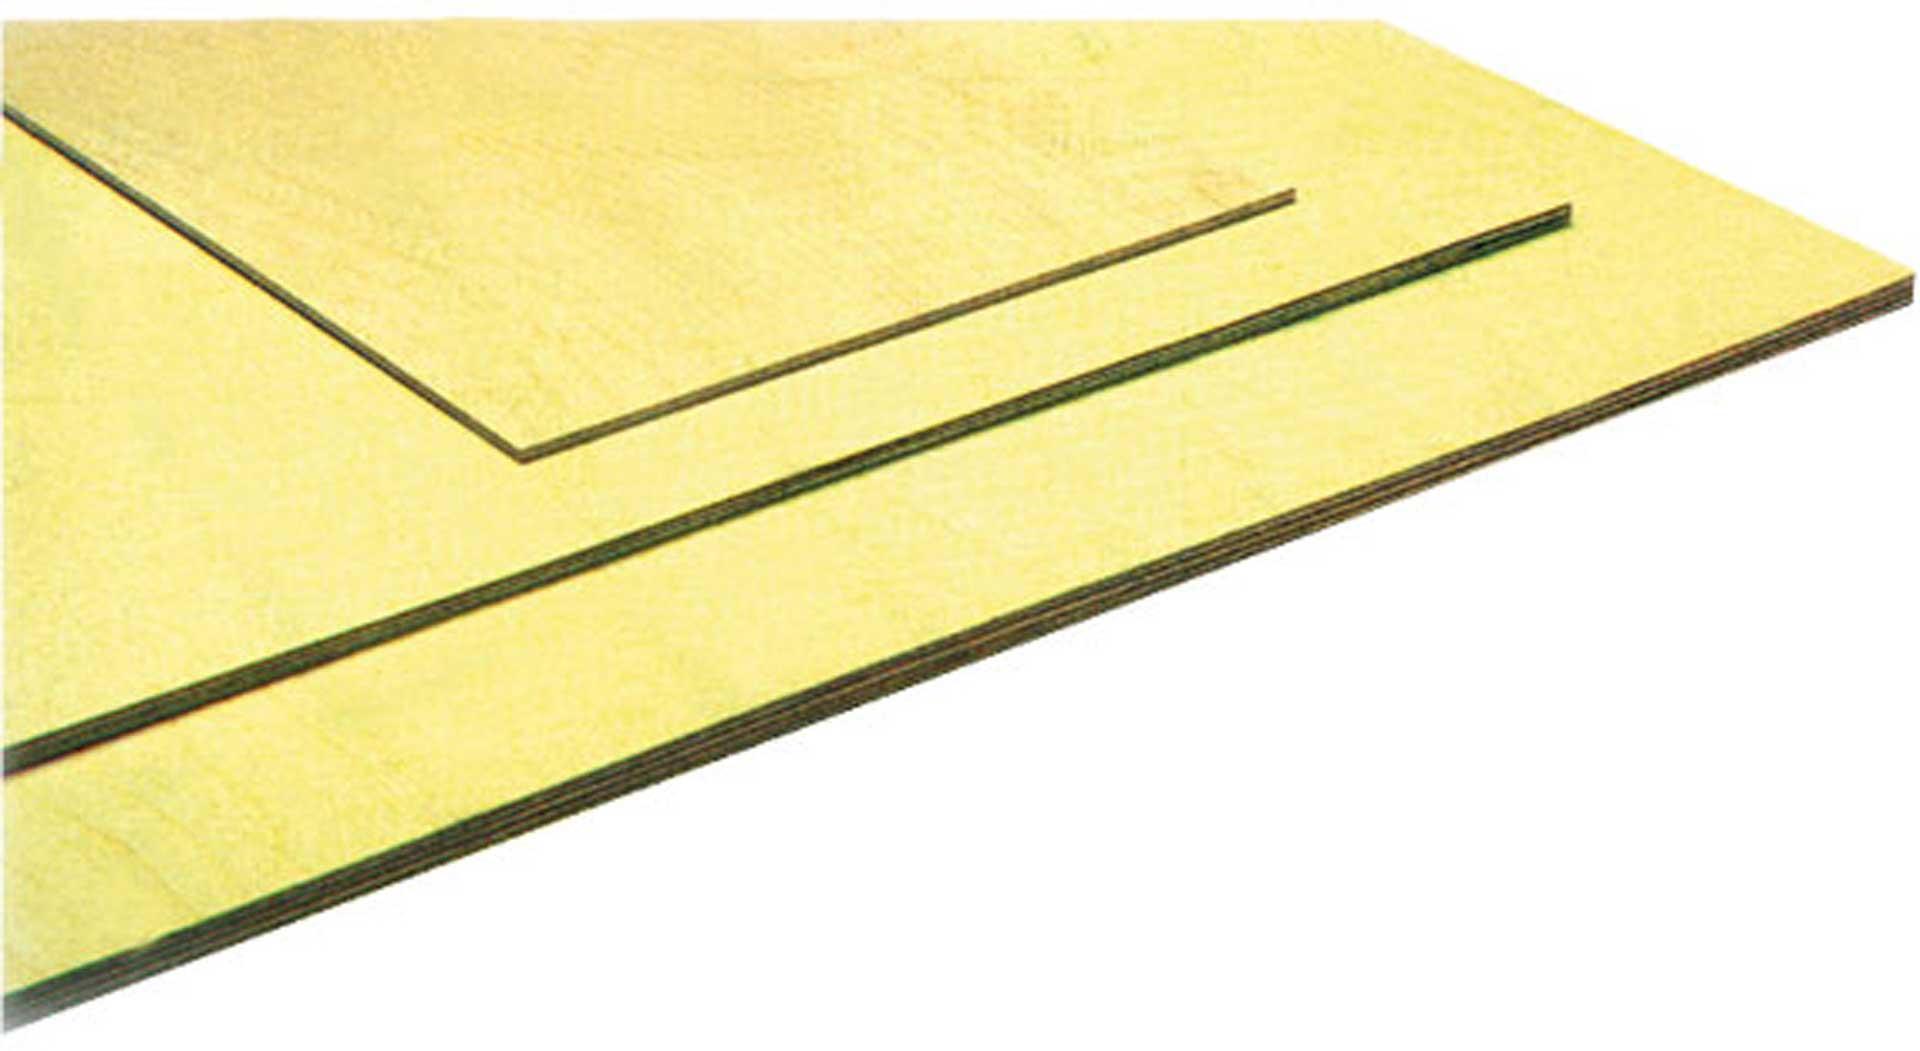 MODELLBAU LINDINGER BIRCH-SPERRY 2,0/300/1000MM 4-FOLD